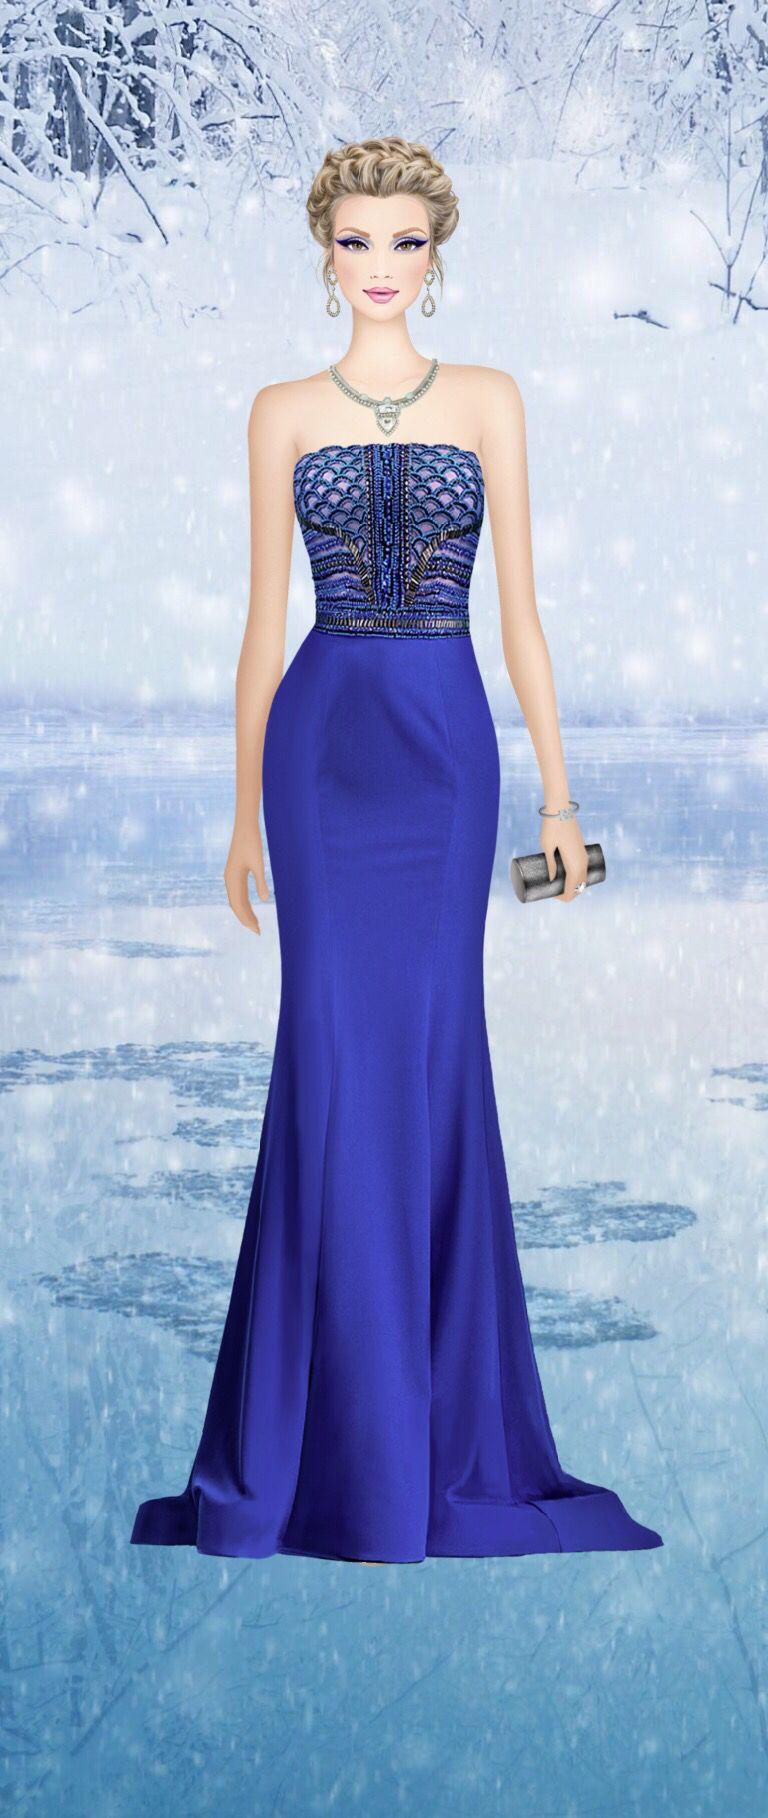 Ice Queen | Covet fashion - vestidos largos | Pinterest | Covet ...